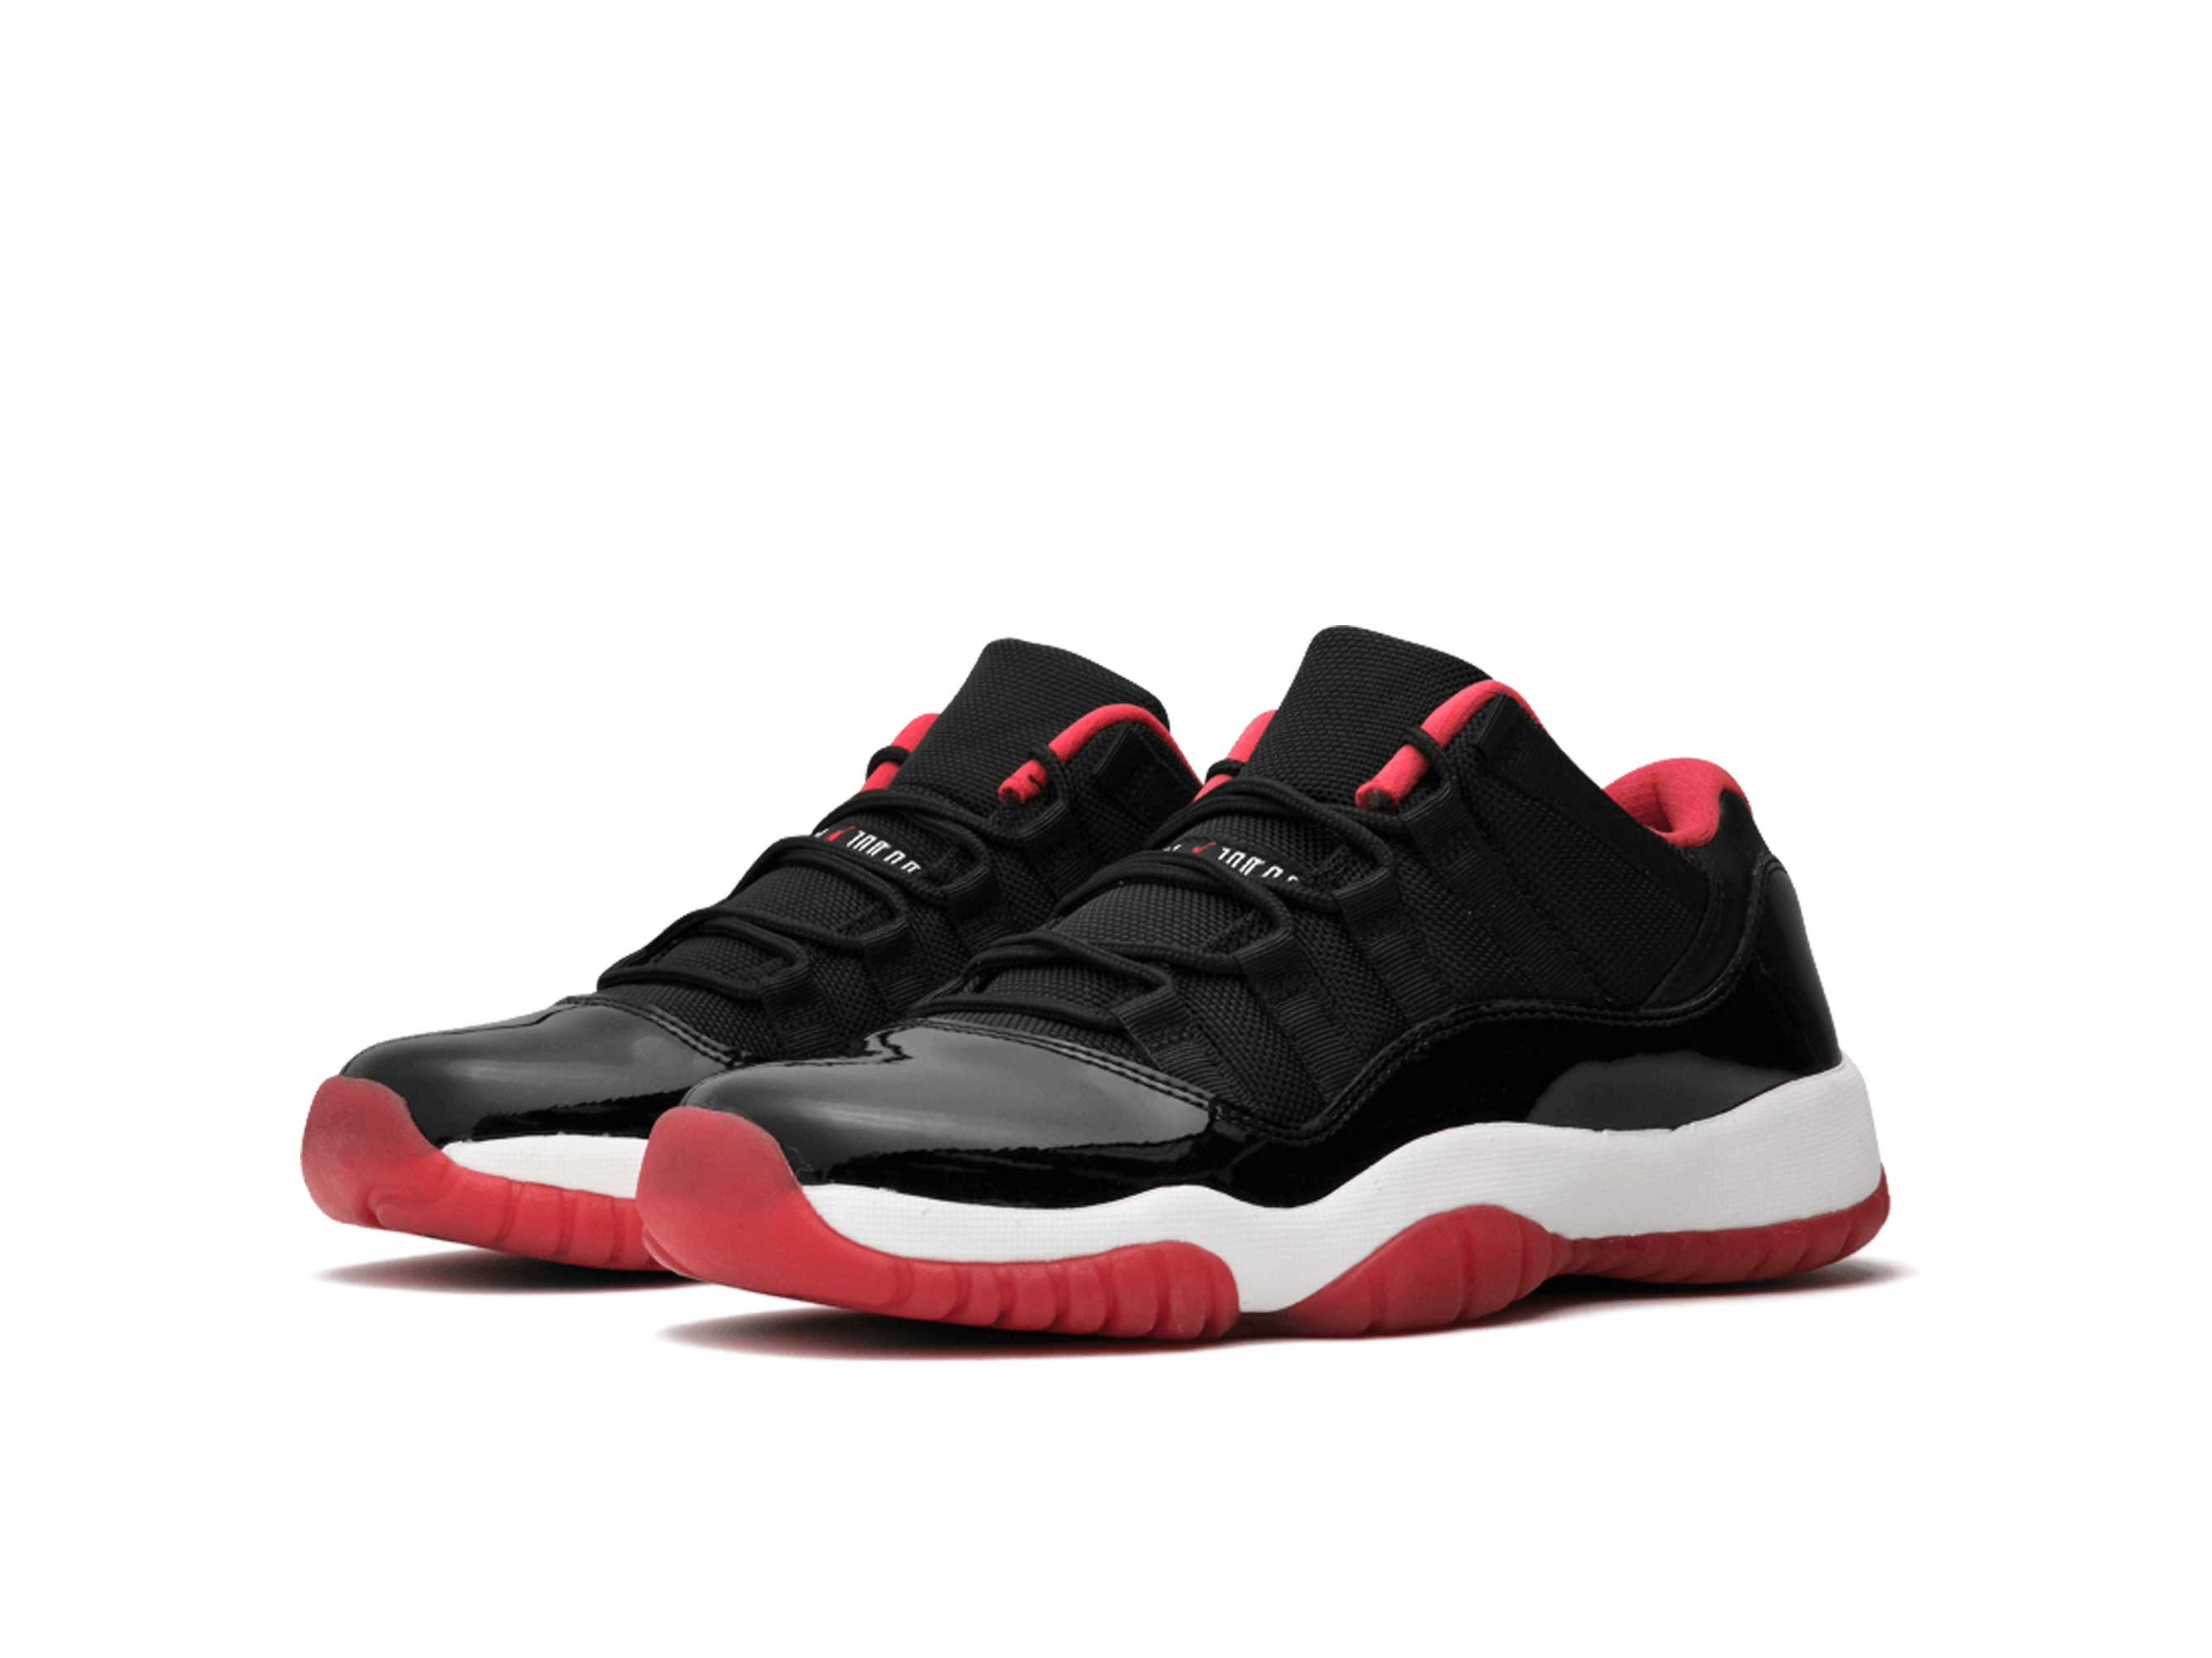 nike air Jordan 11 retro low bg black red 528896_012 купить